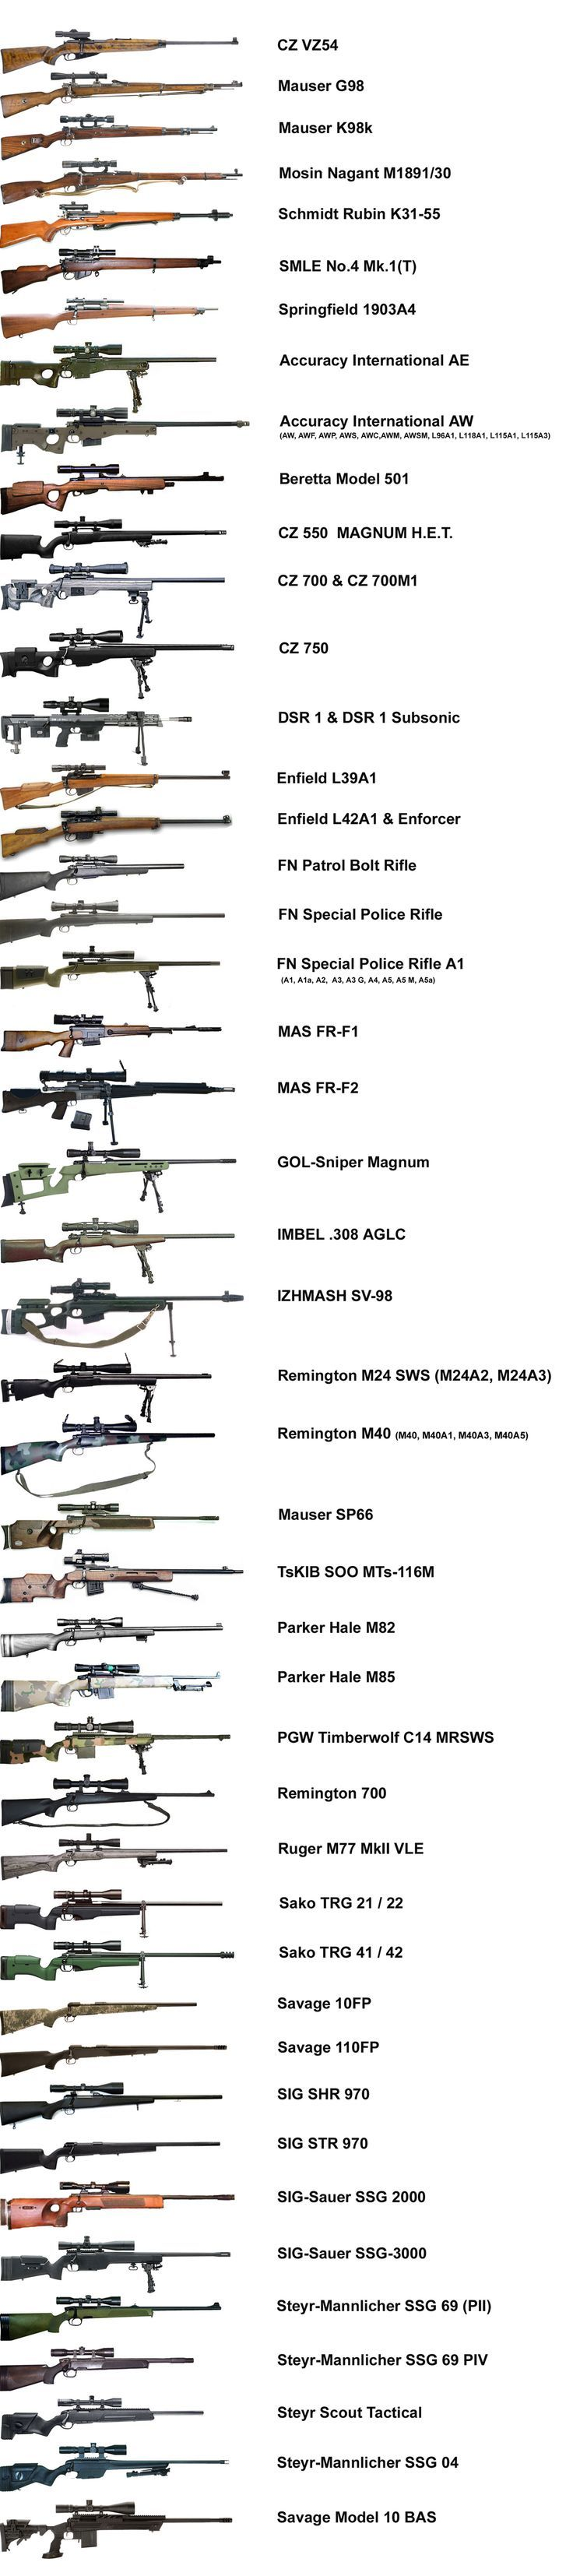 Sniper Rifles | Infographic | Pinterest